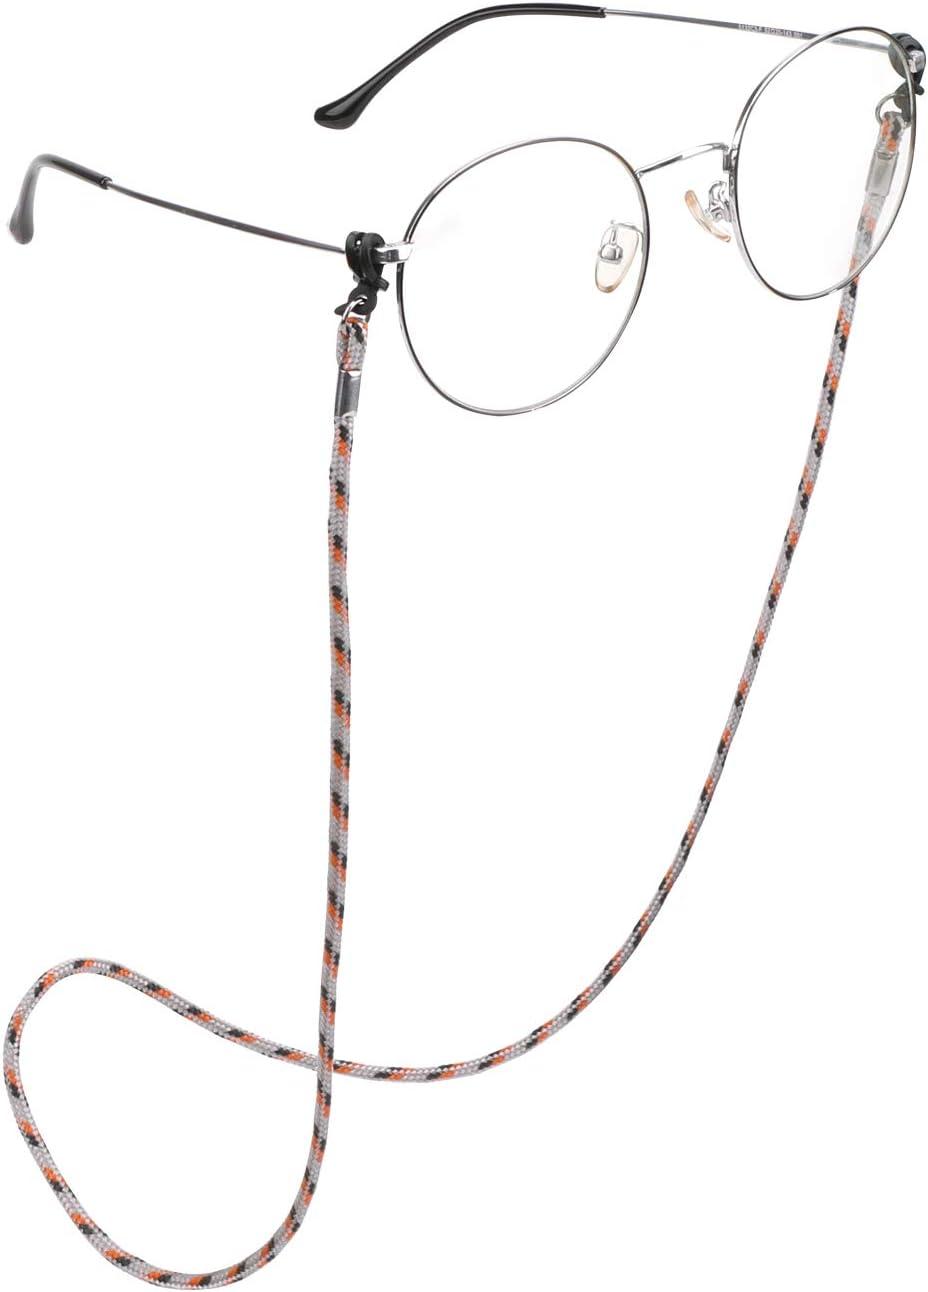 Brillenschnur Brillenkette Brillenkordel Hifot Brillenband Leder 8 St/ück geflochtenem PU leder kette f/ür Lesebrille /& Sonnenbrille Strap